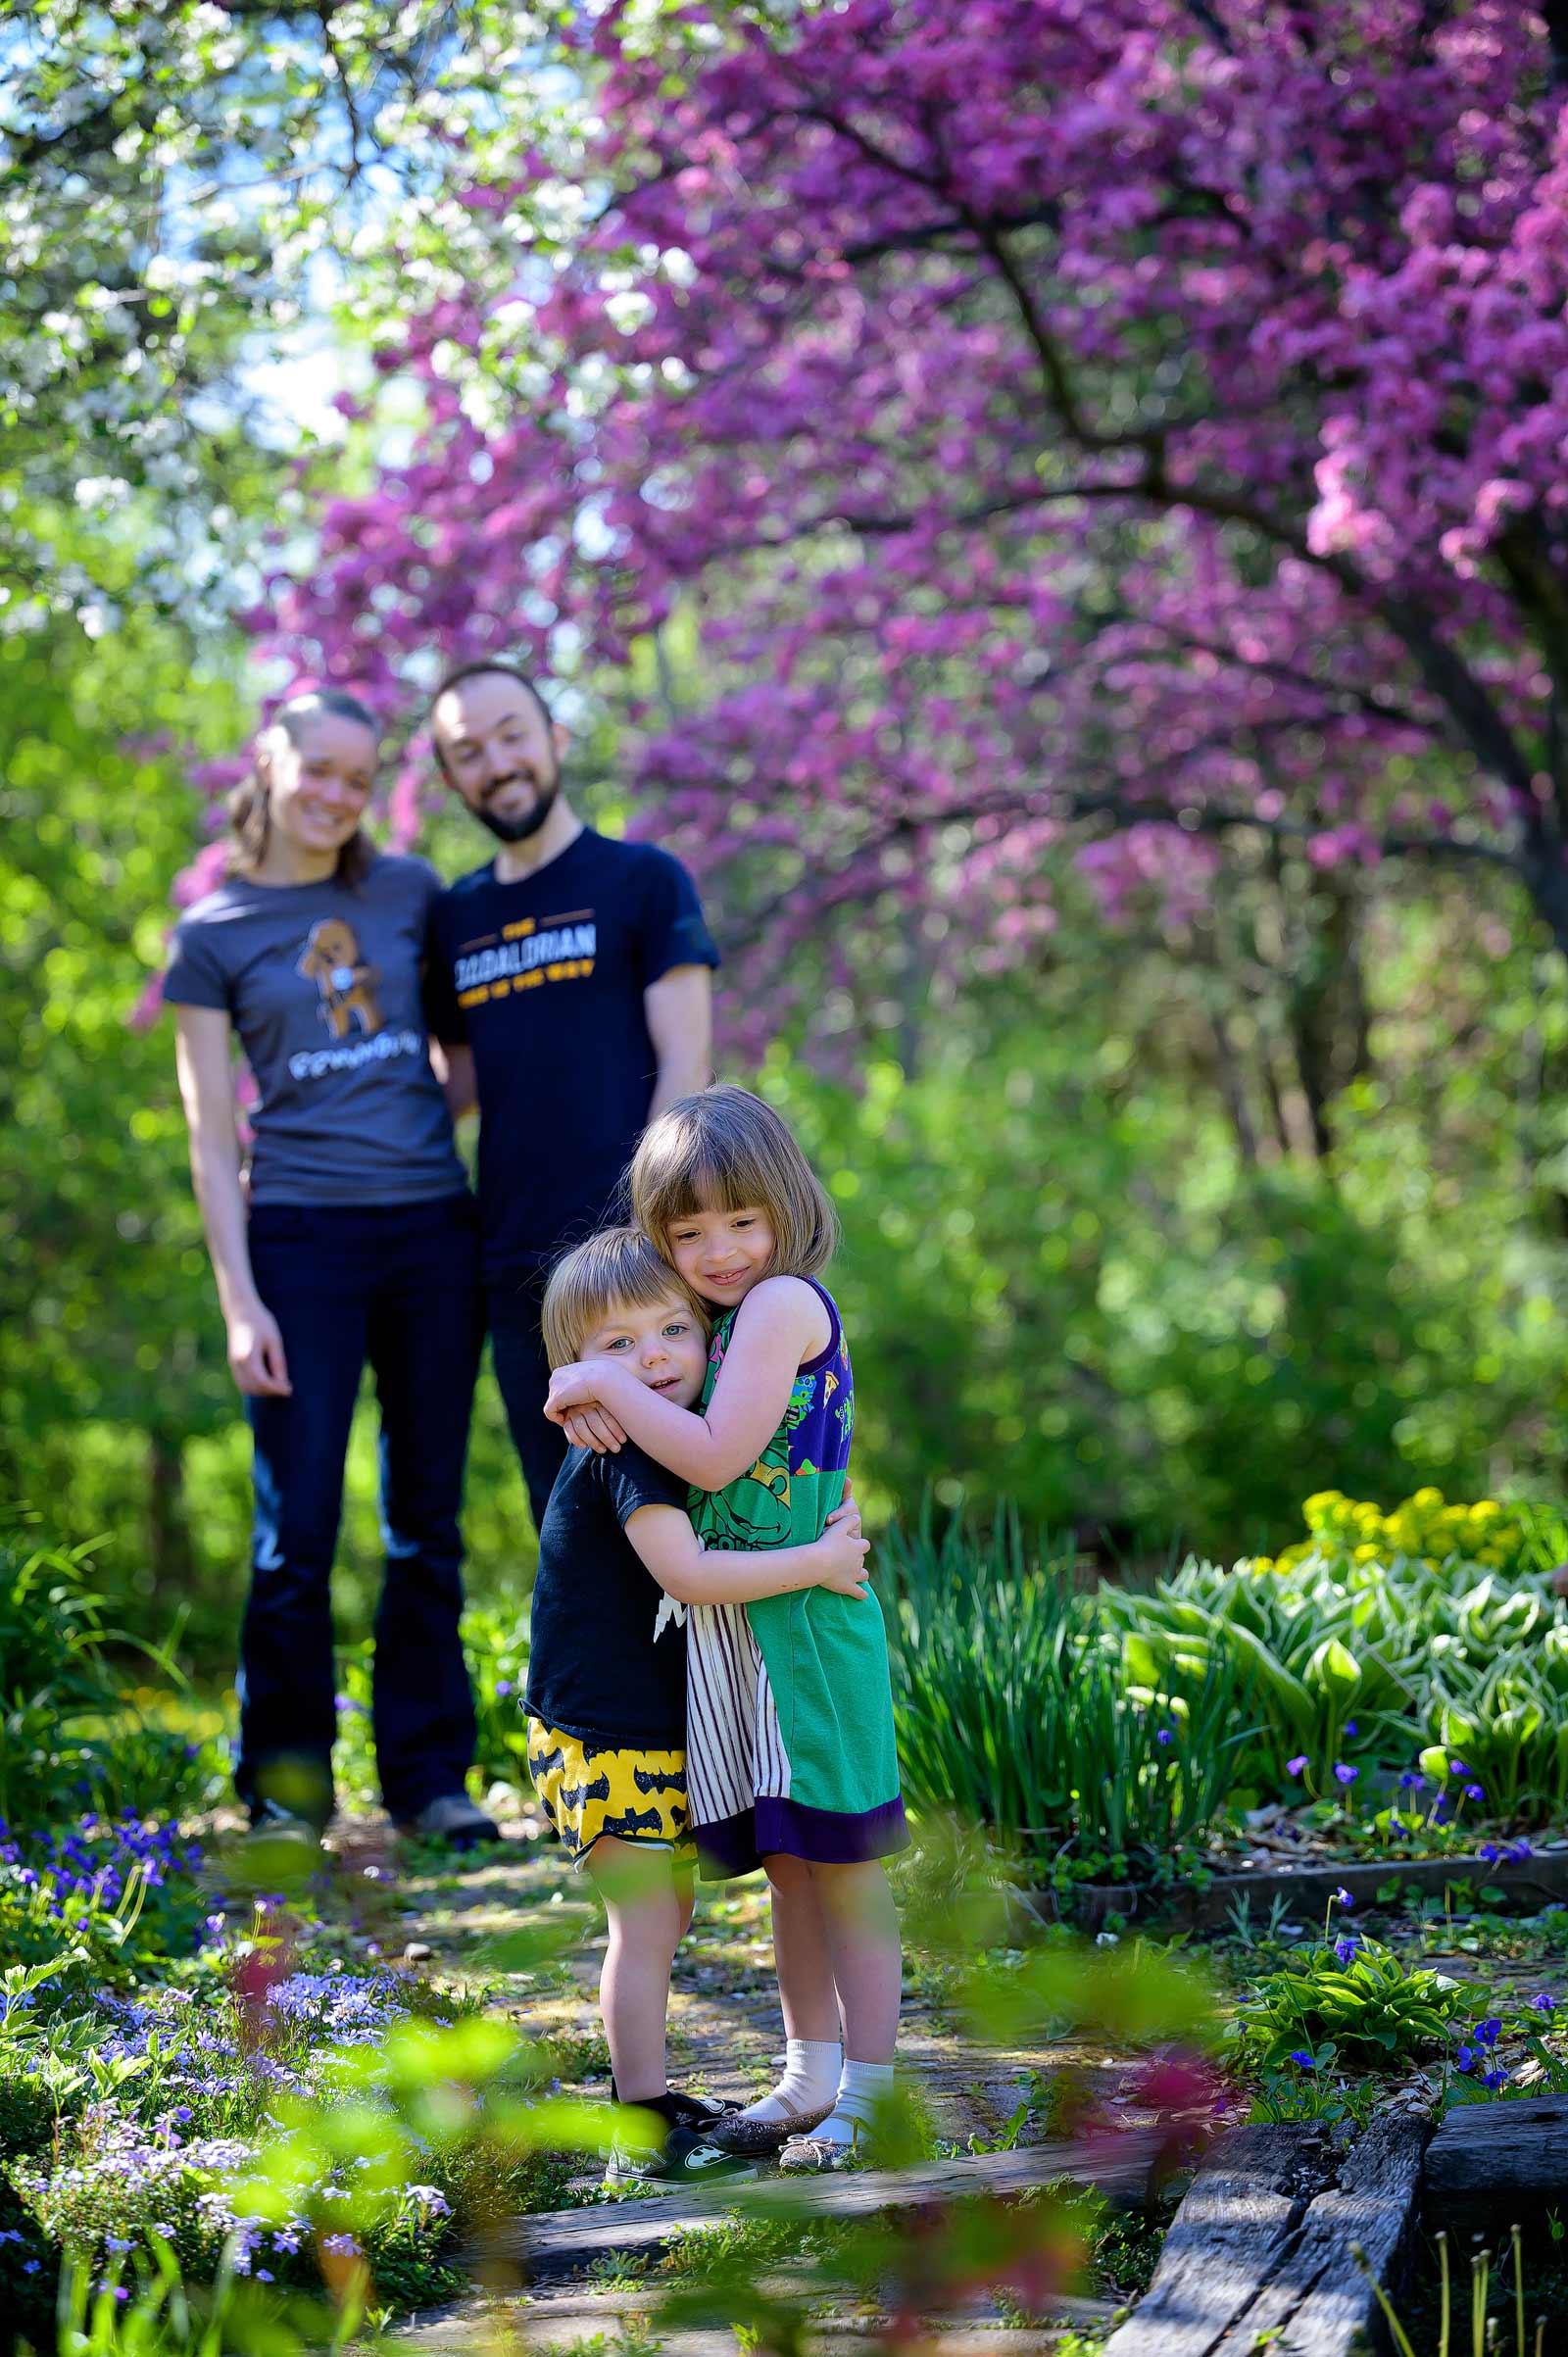 boucherfamily-minigeeks-spring2021-12